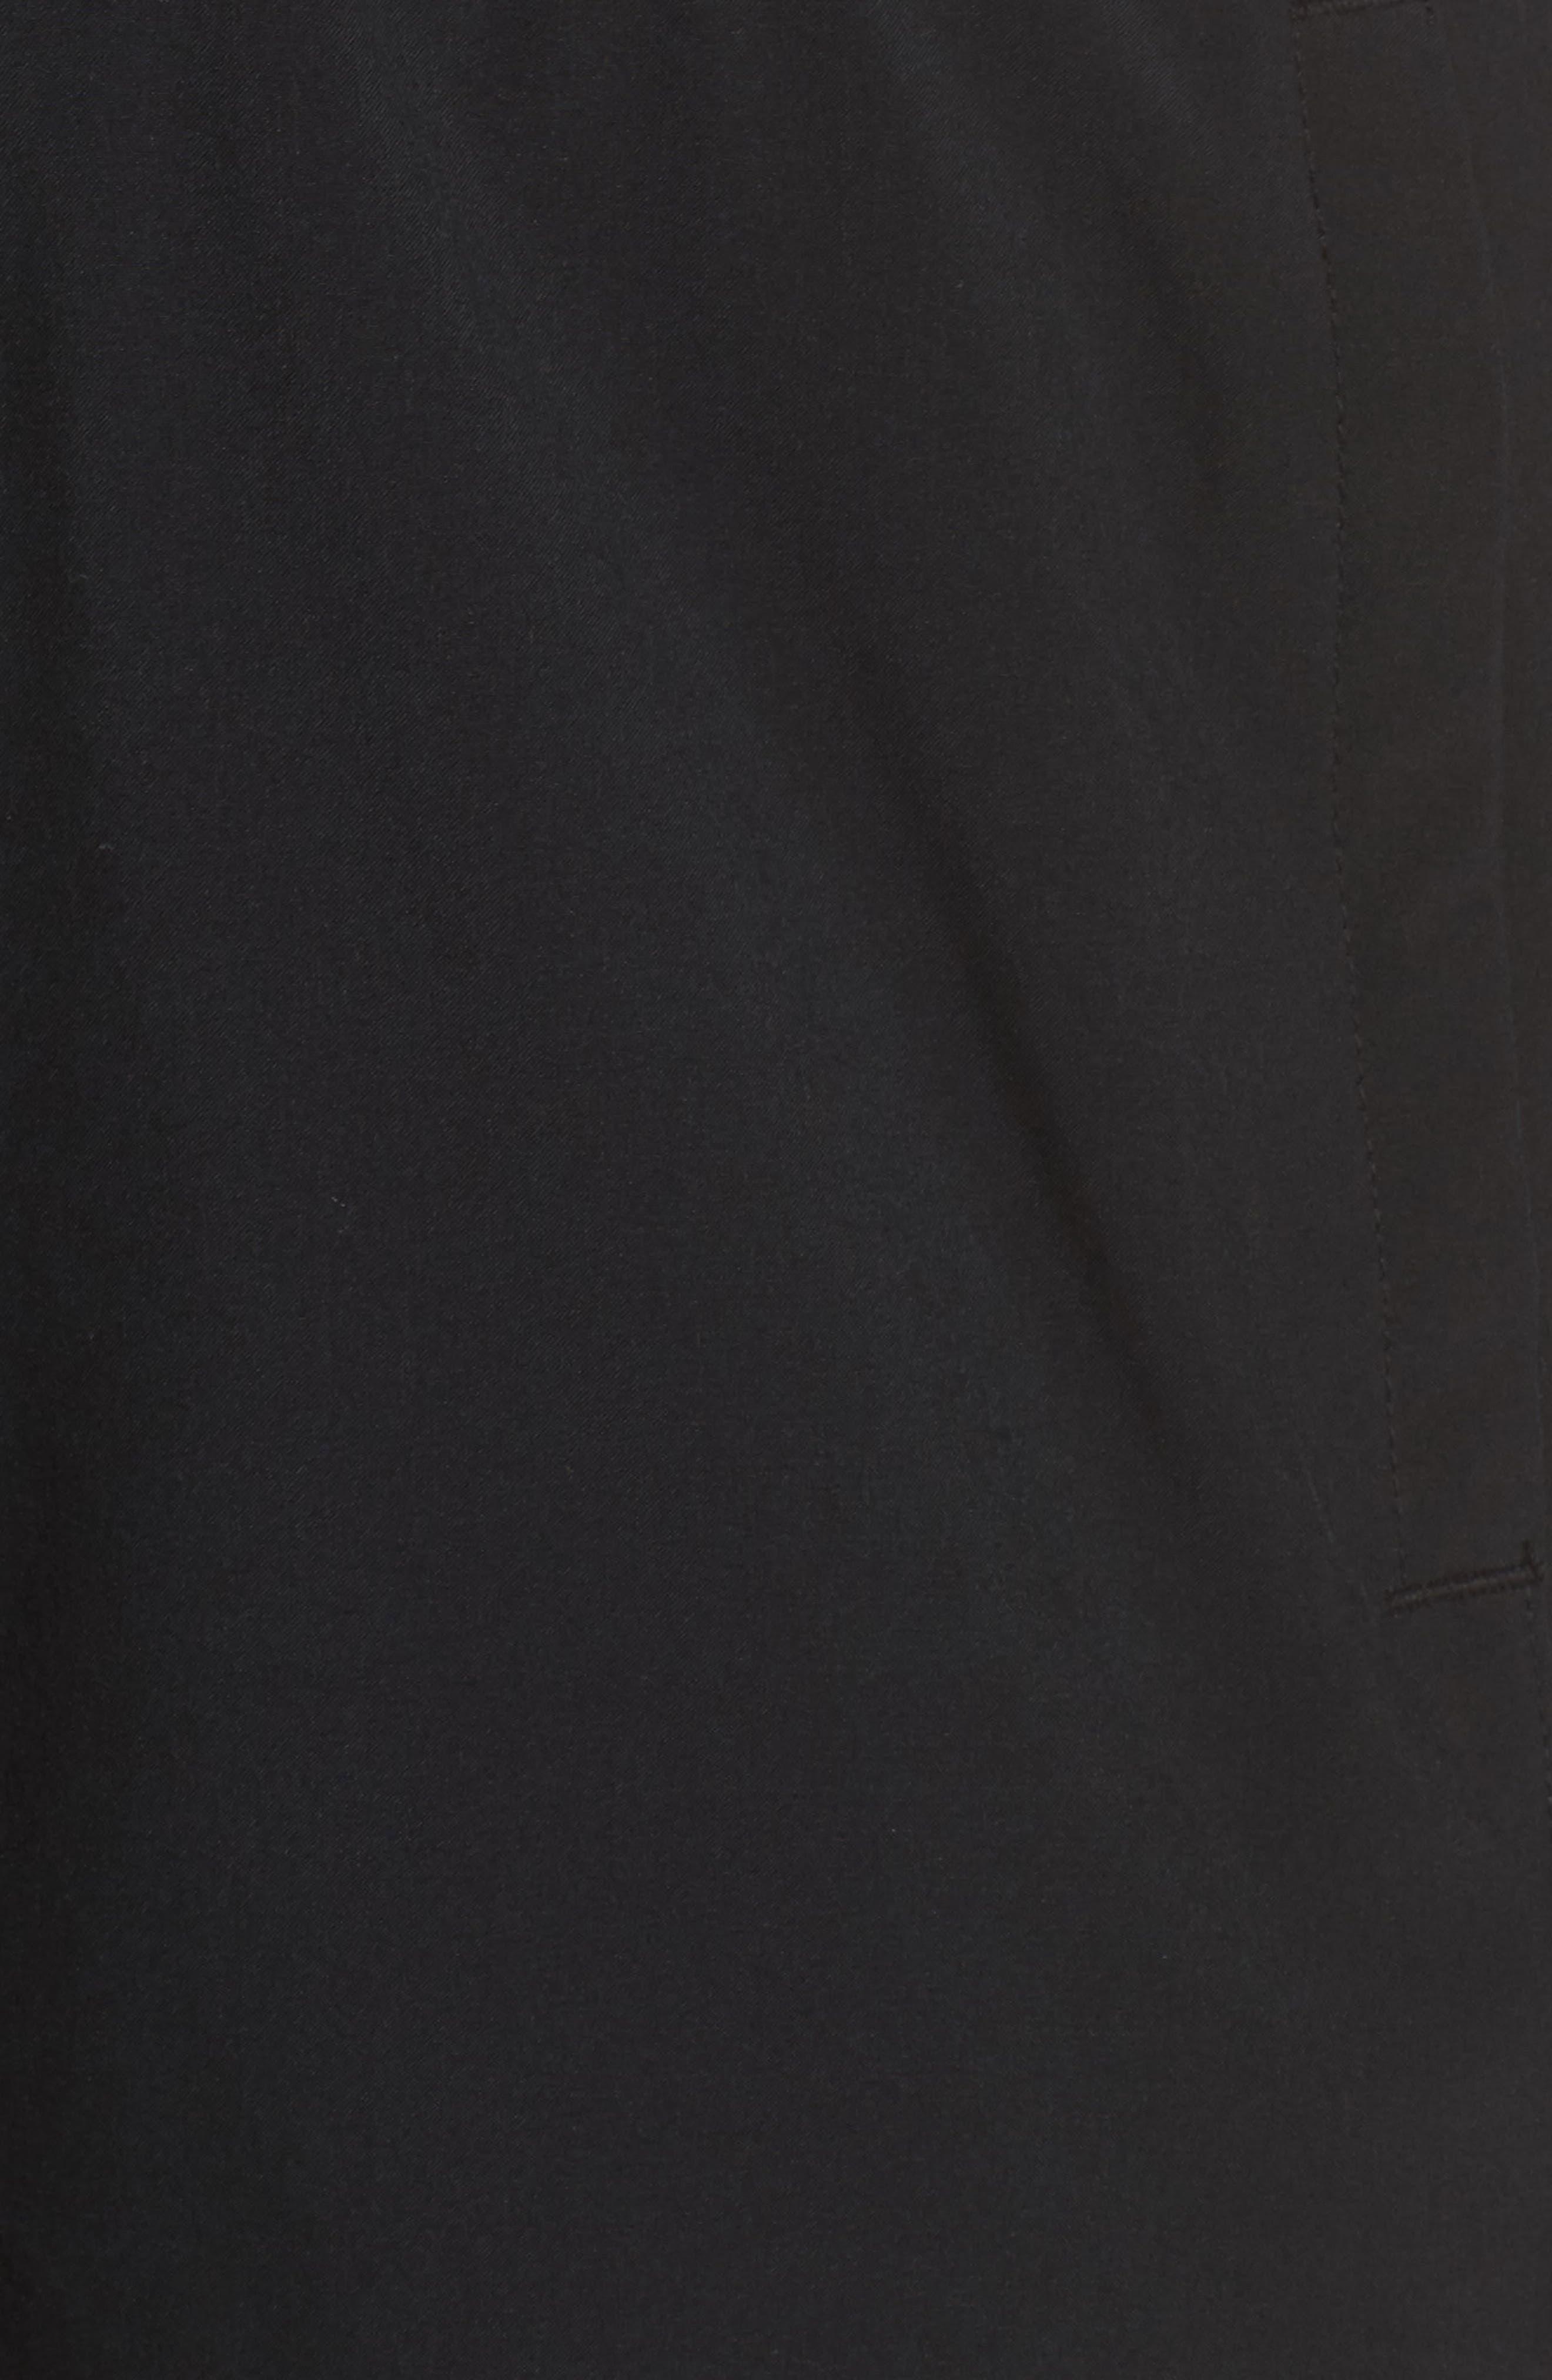 Chaser 7 Shorts,                             Alternate thumbnail 6, color,                             Black